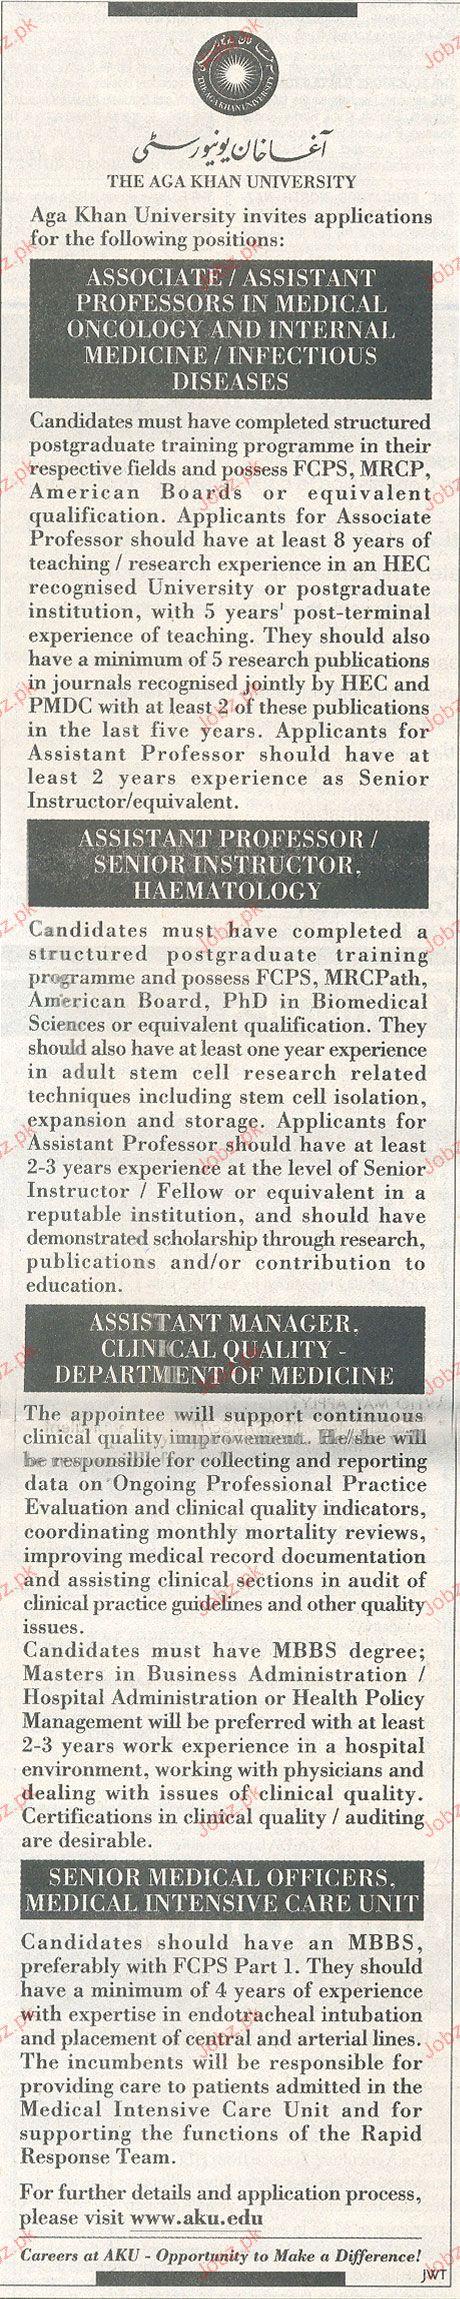 Associate / Assistant Professor Job Opportunity